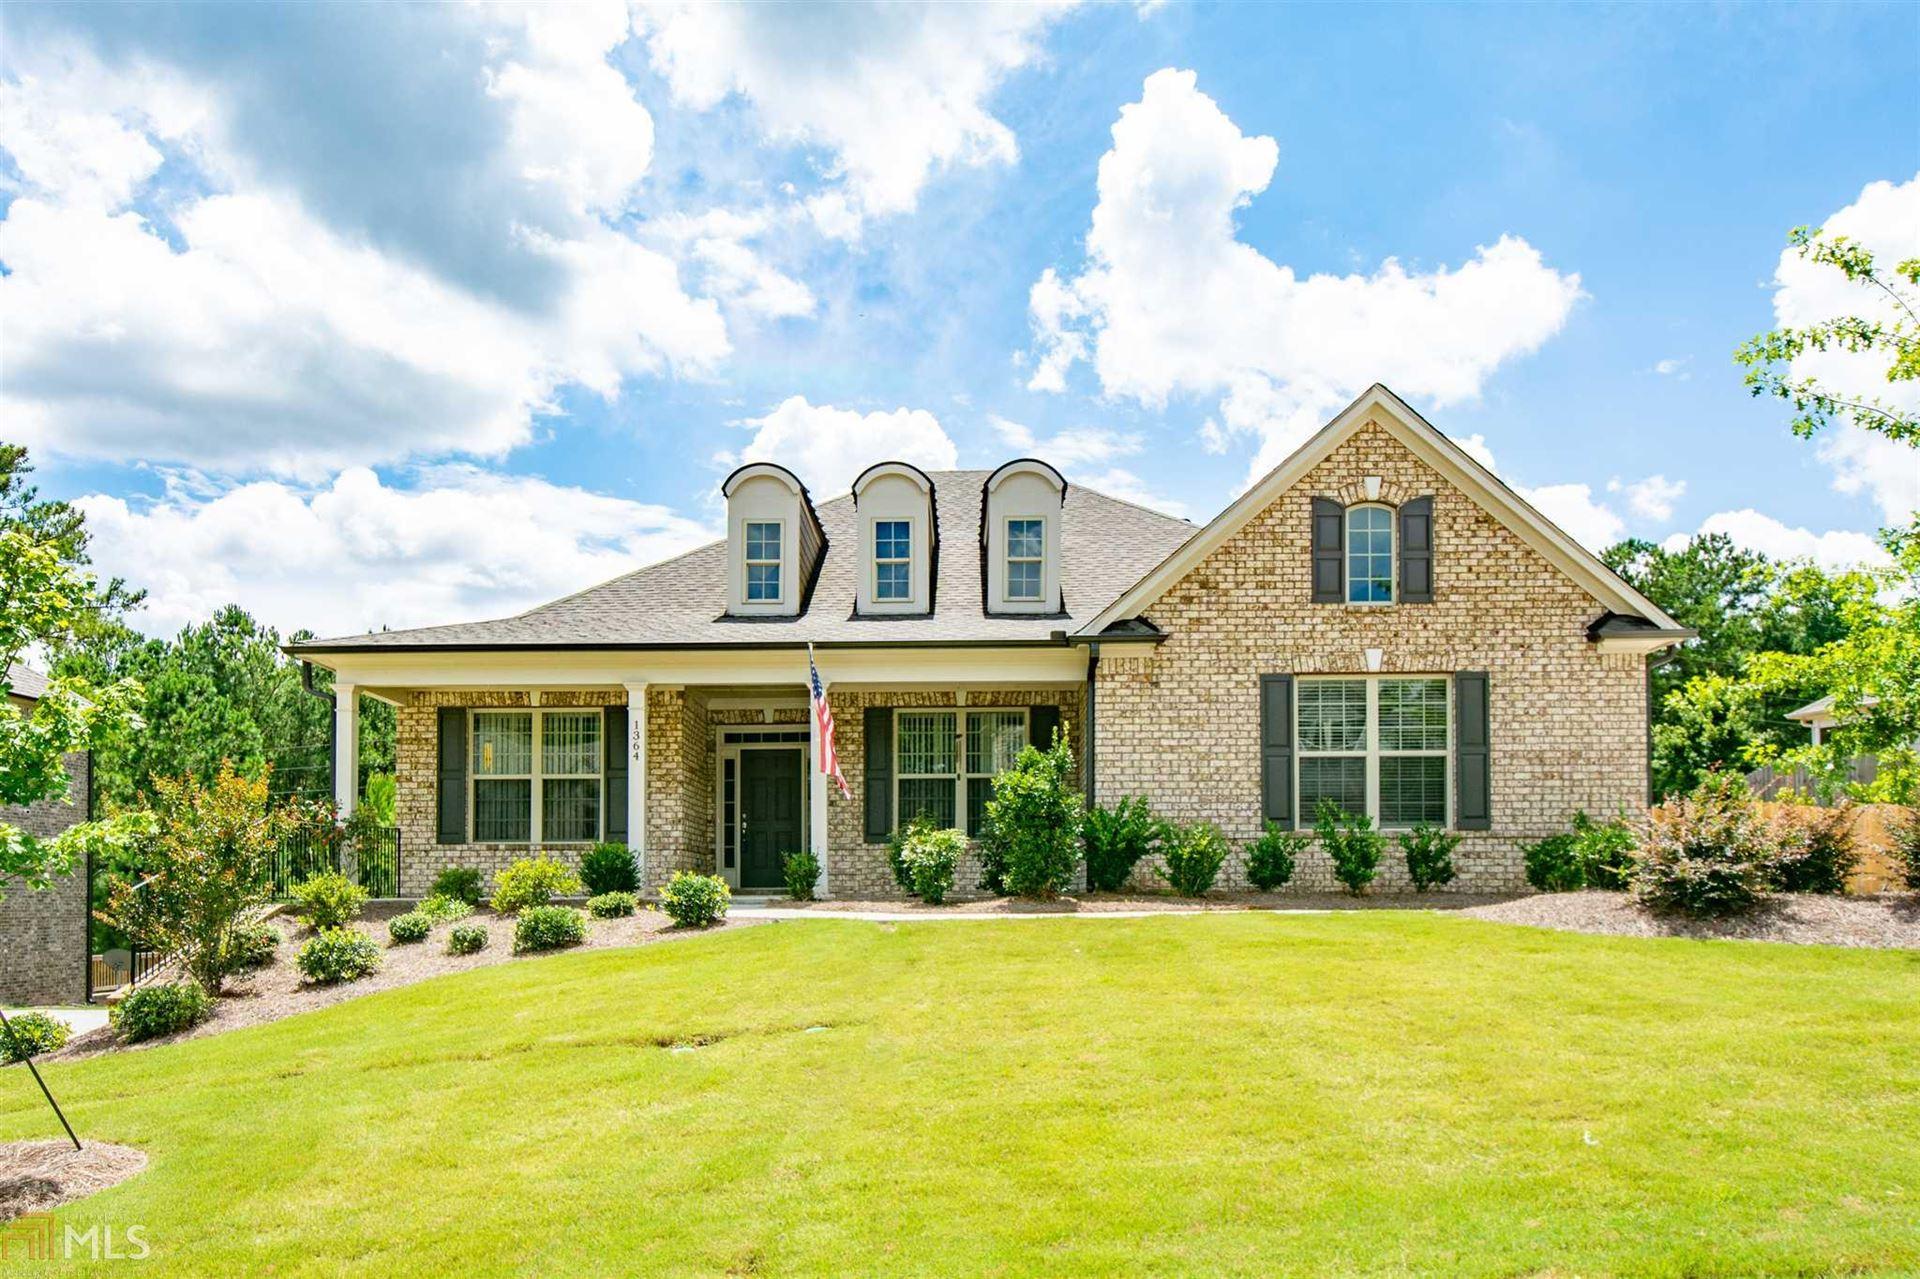 1364 Highland Wood Ct, Auburn, GA 30011 - #: 8818768